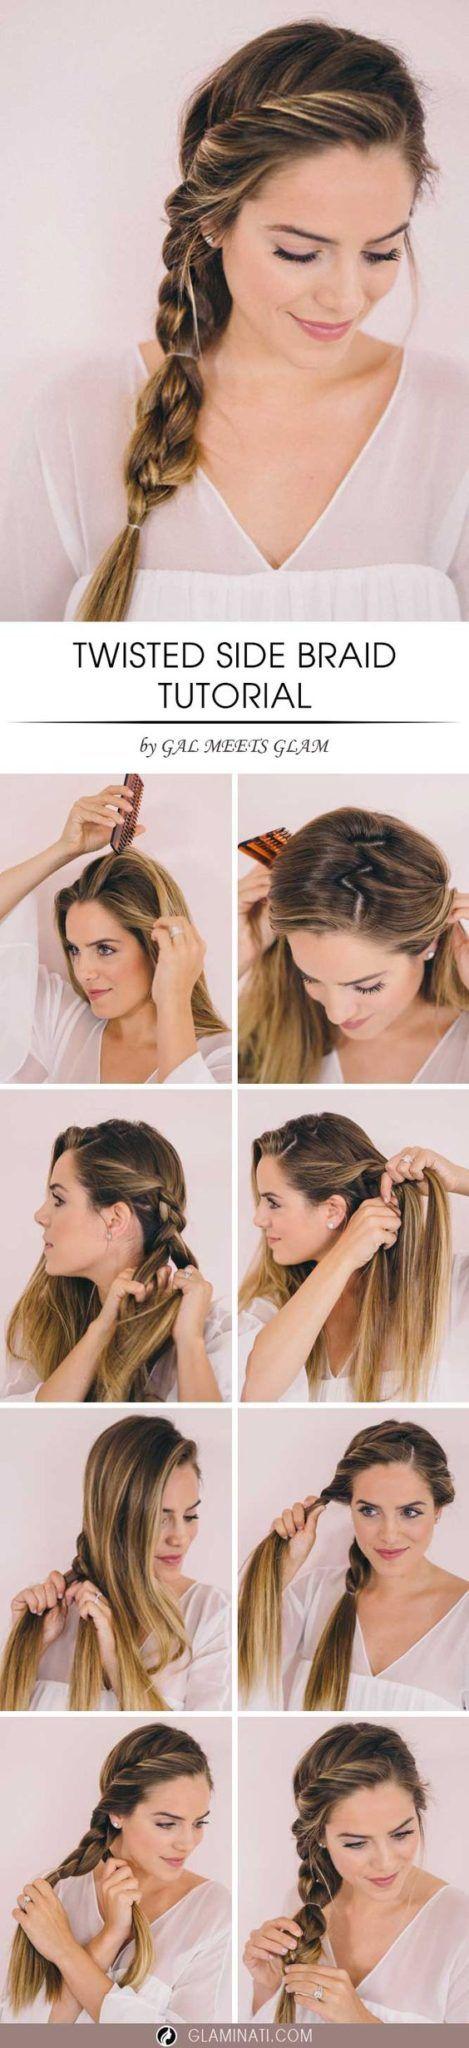 best 25+ easy hairstyles ideas on pinterest   simple hairstyles